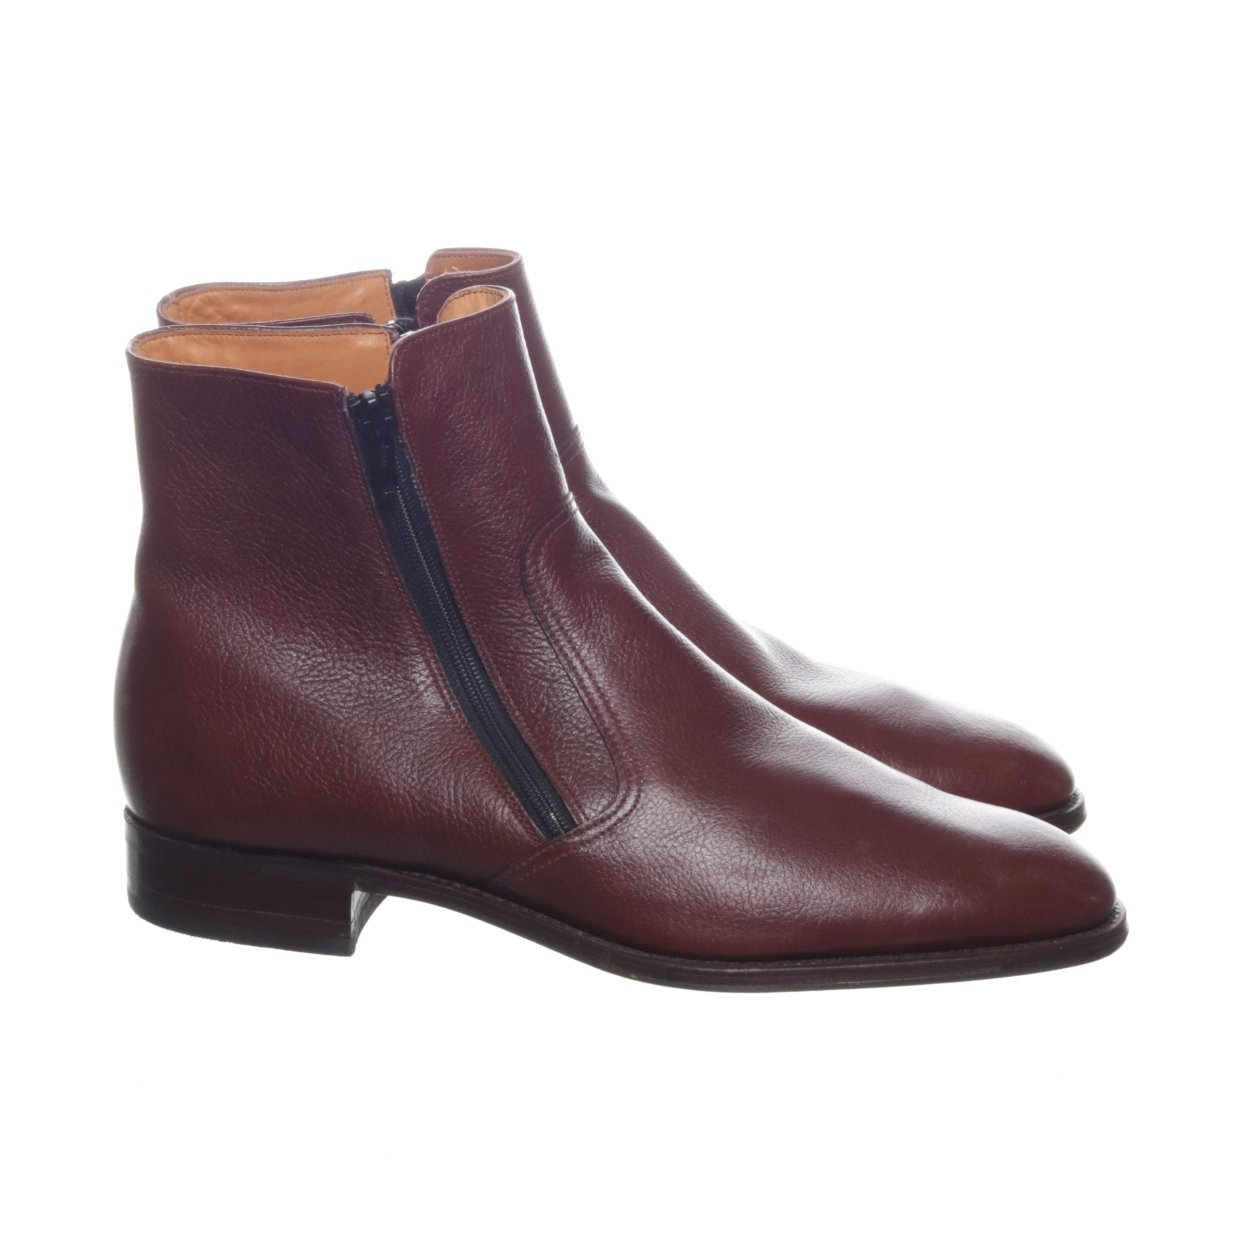 Loake, Boots, Strl: 42, Brun, Skinn